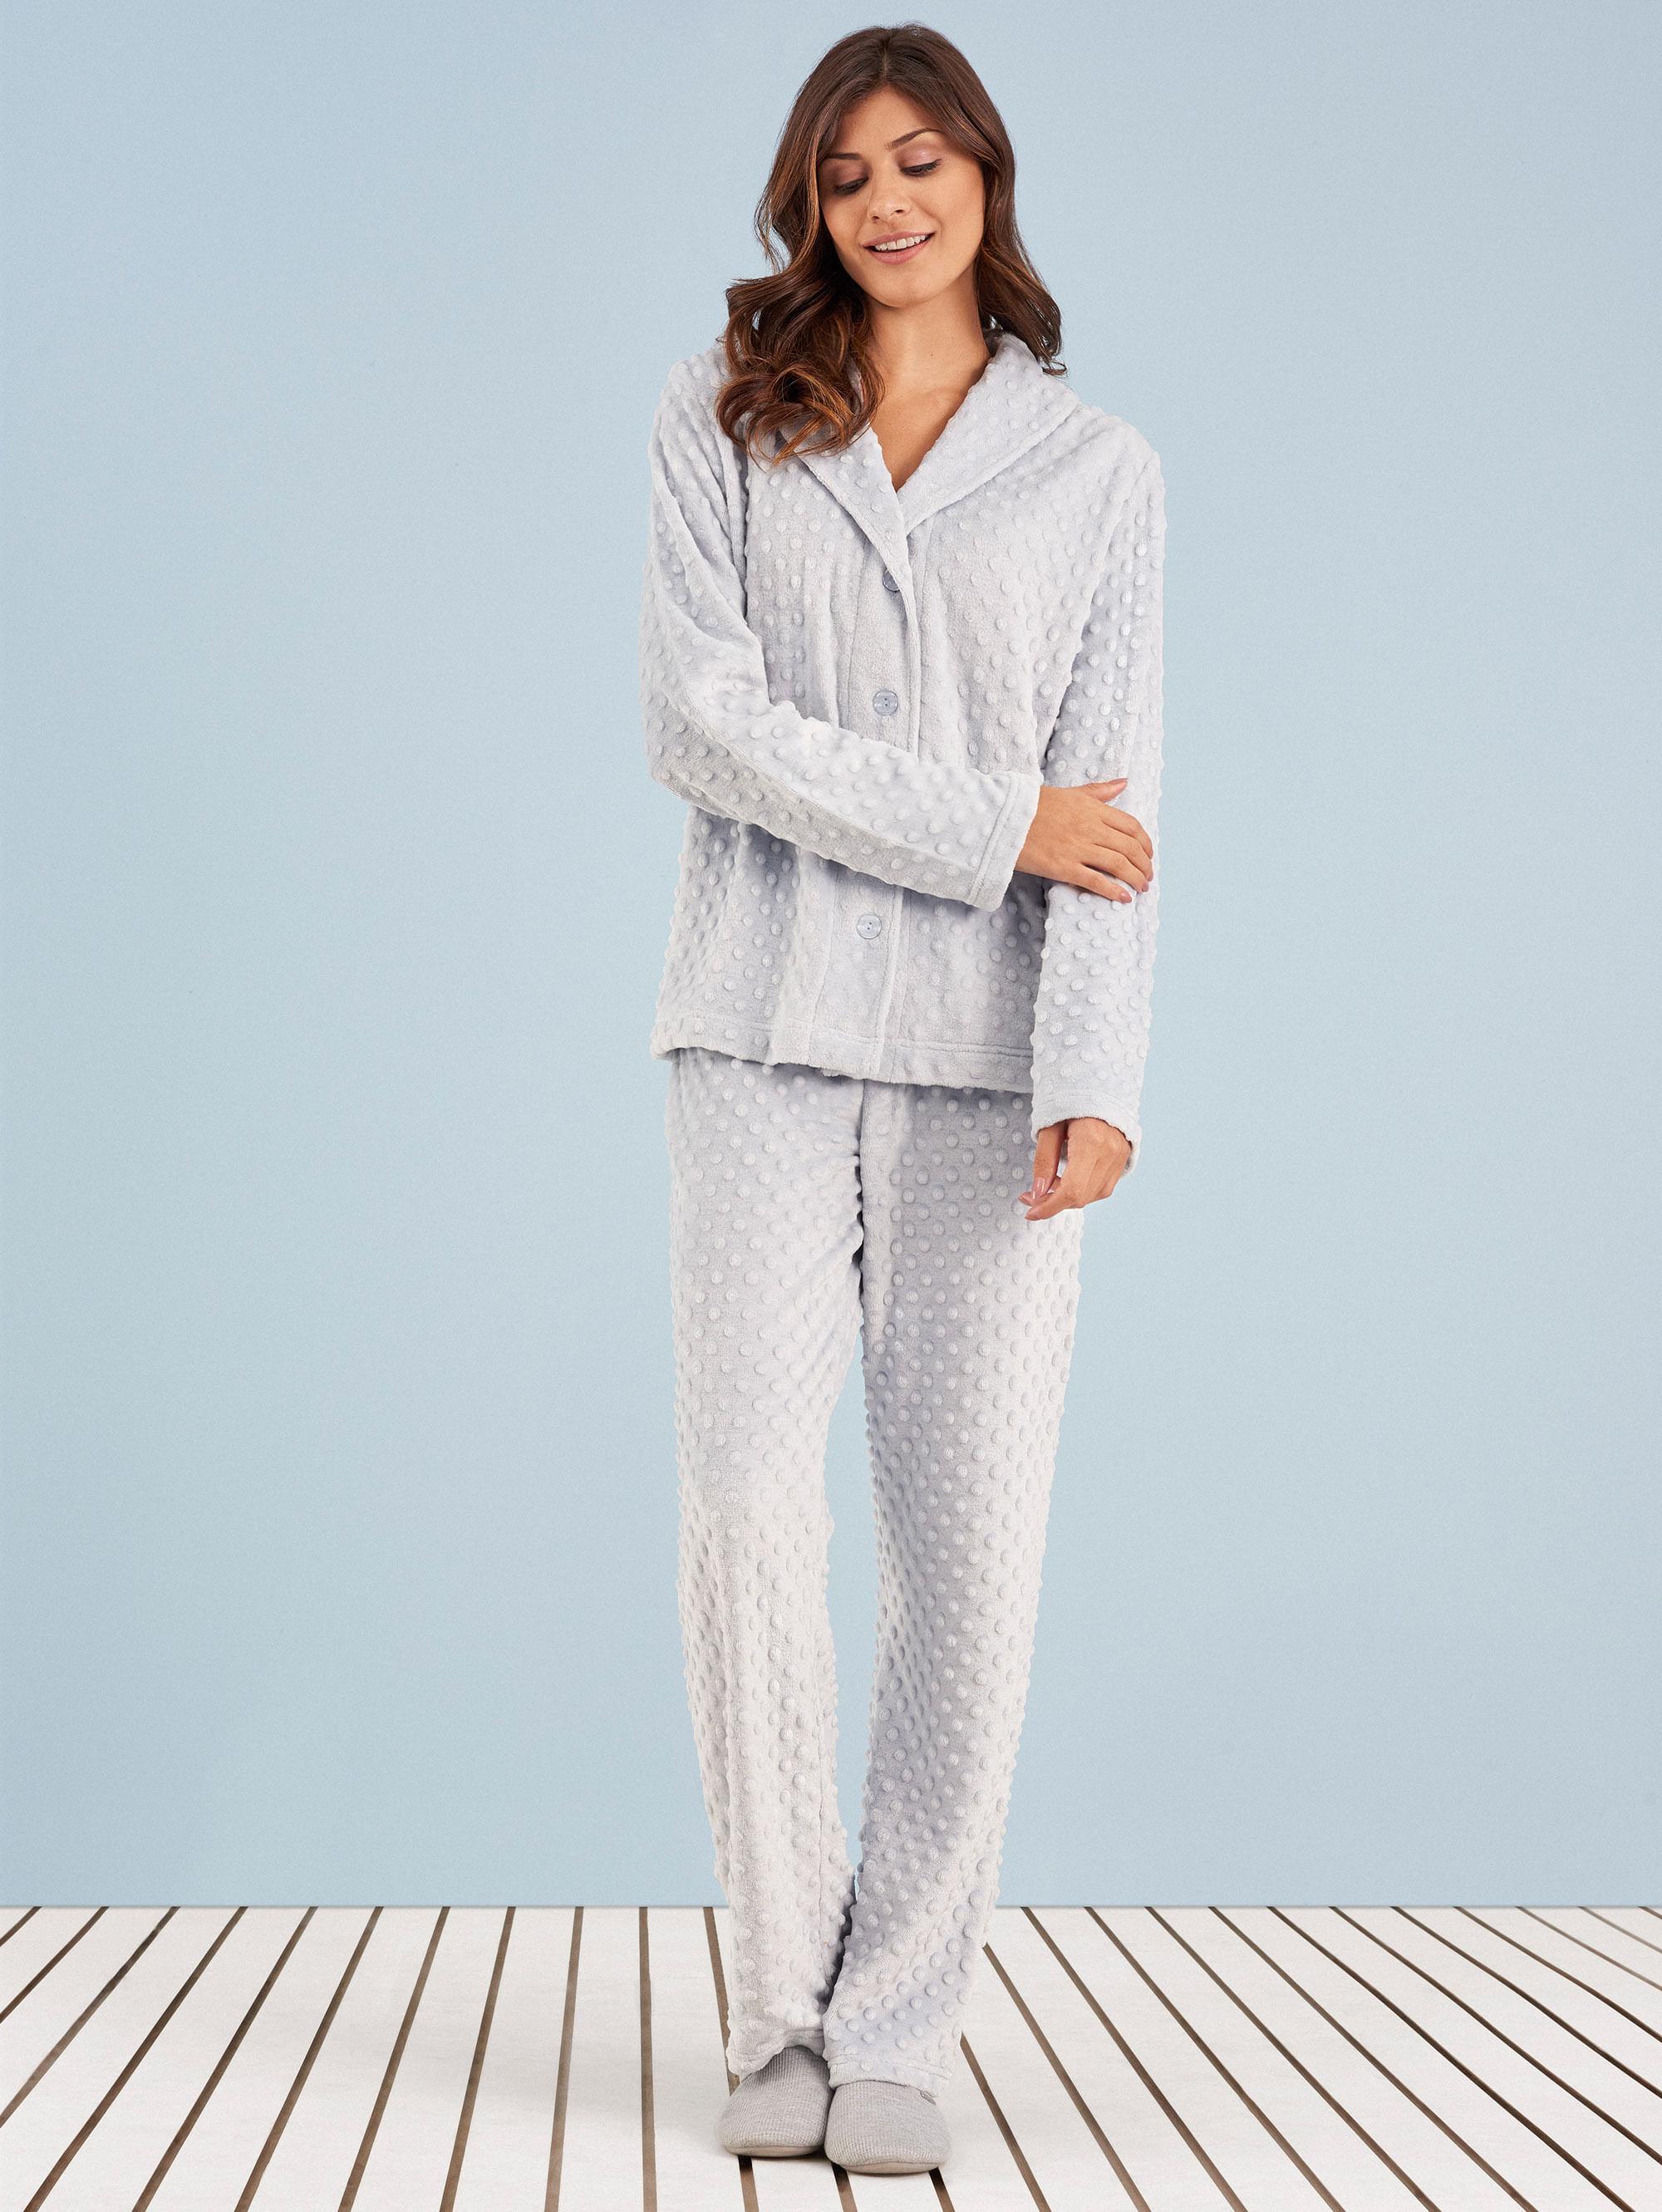 pijama-manga-longa-soft-aberto-jessica-any-any